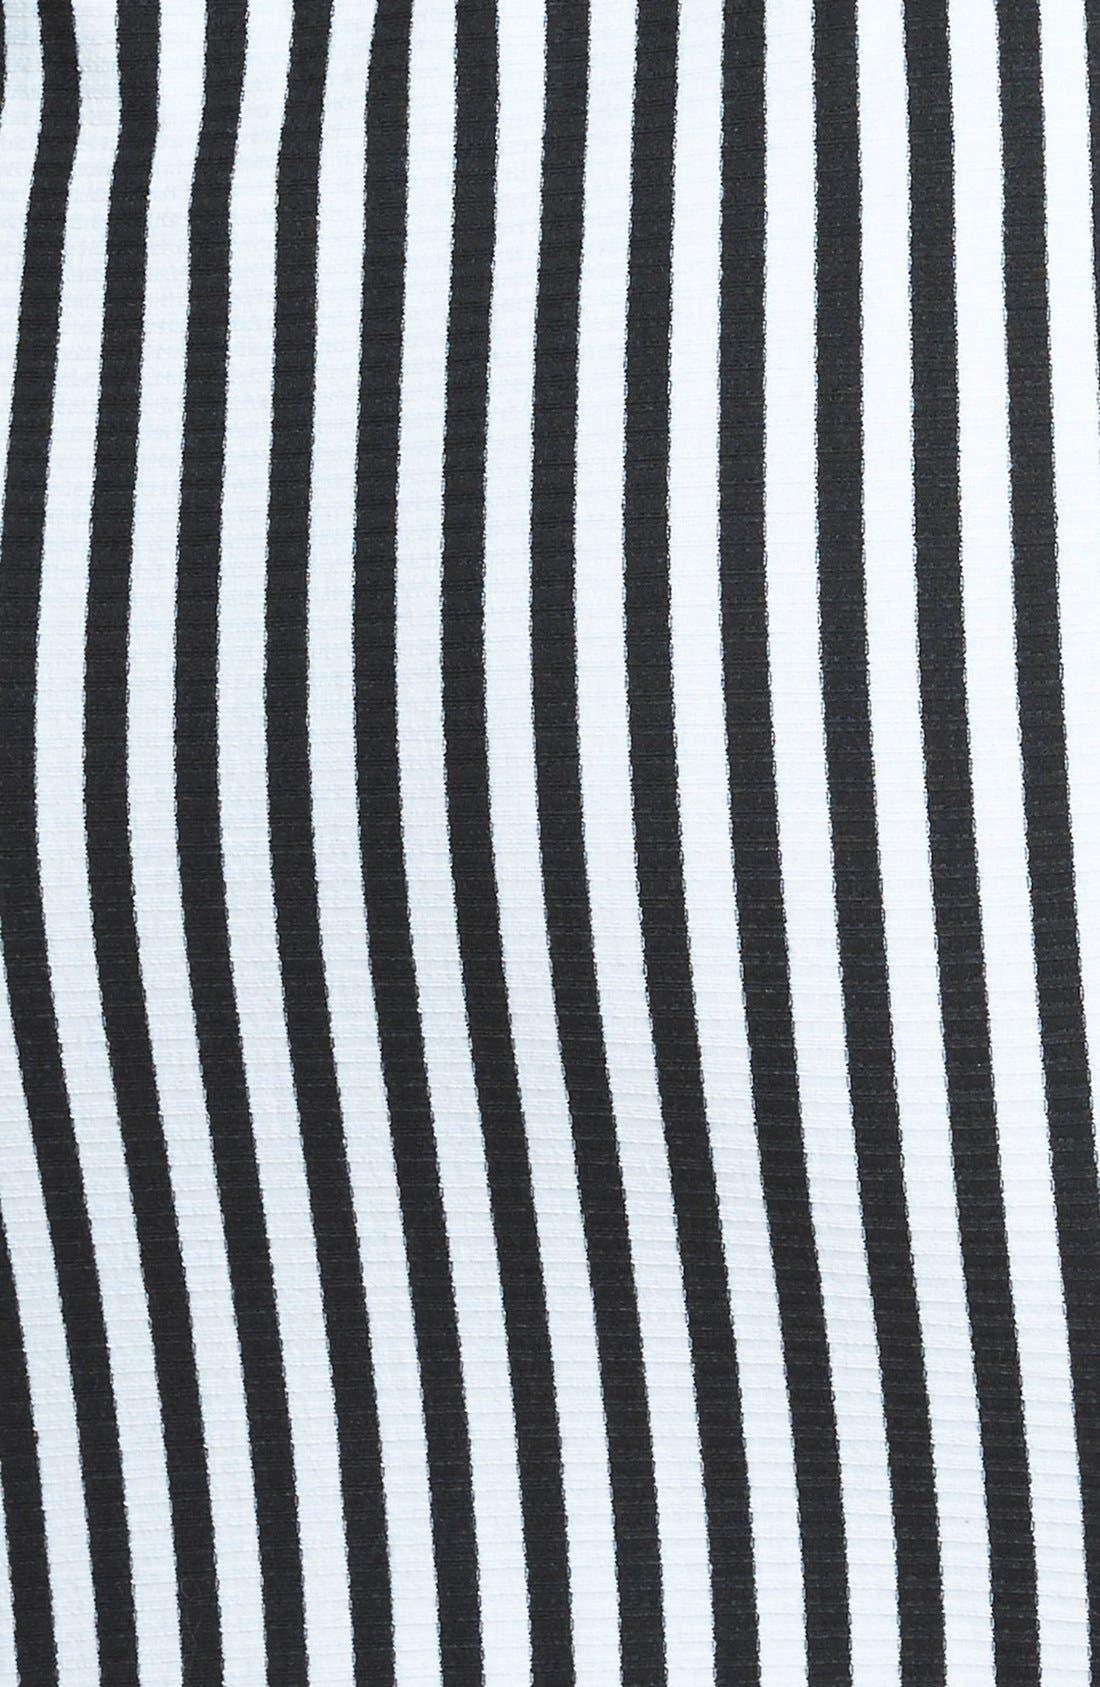 'Stealing Harvard' Midi Dress,                             Alternate thumbnail 2, color,                             001